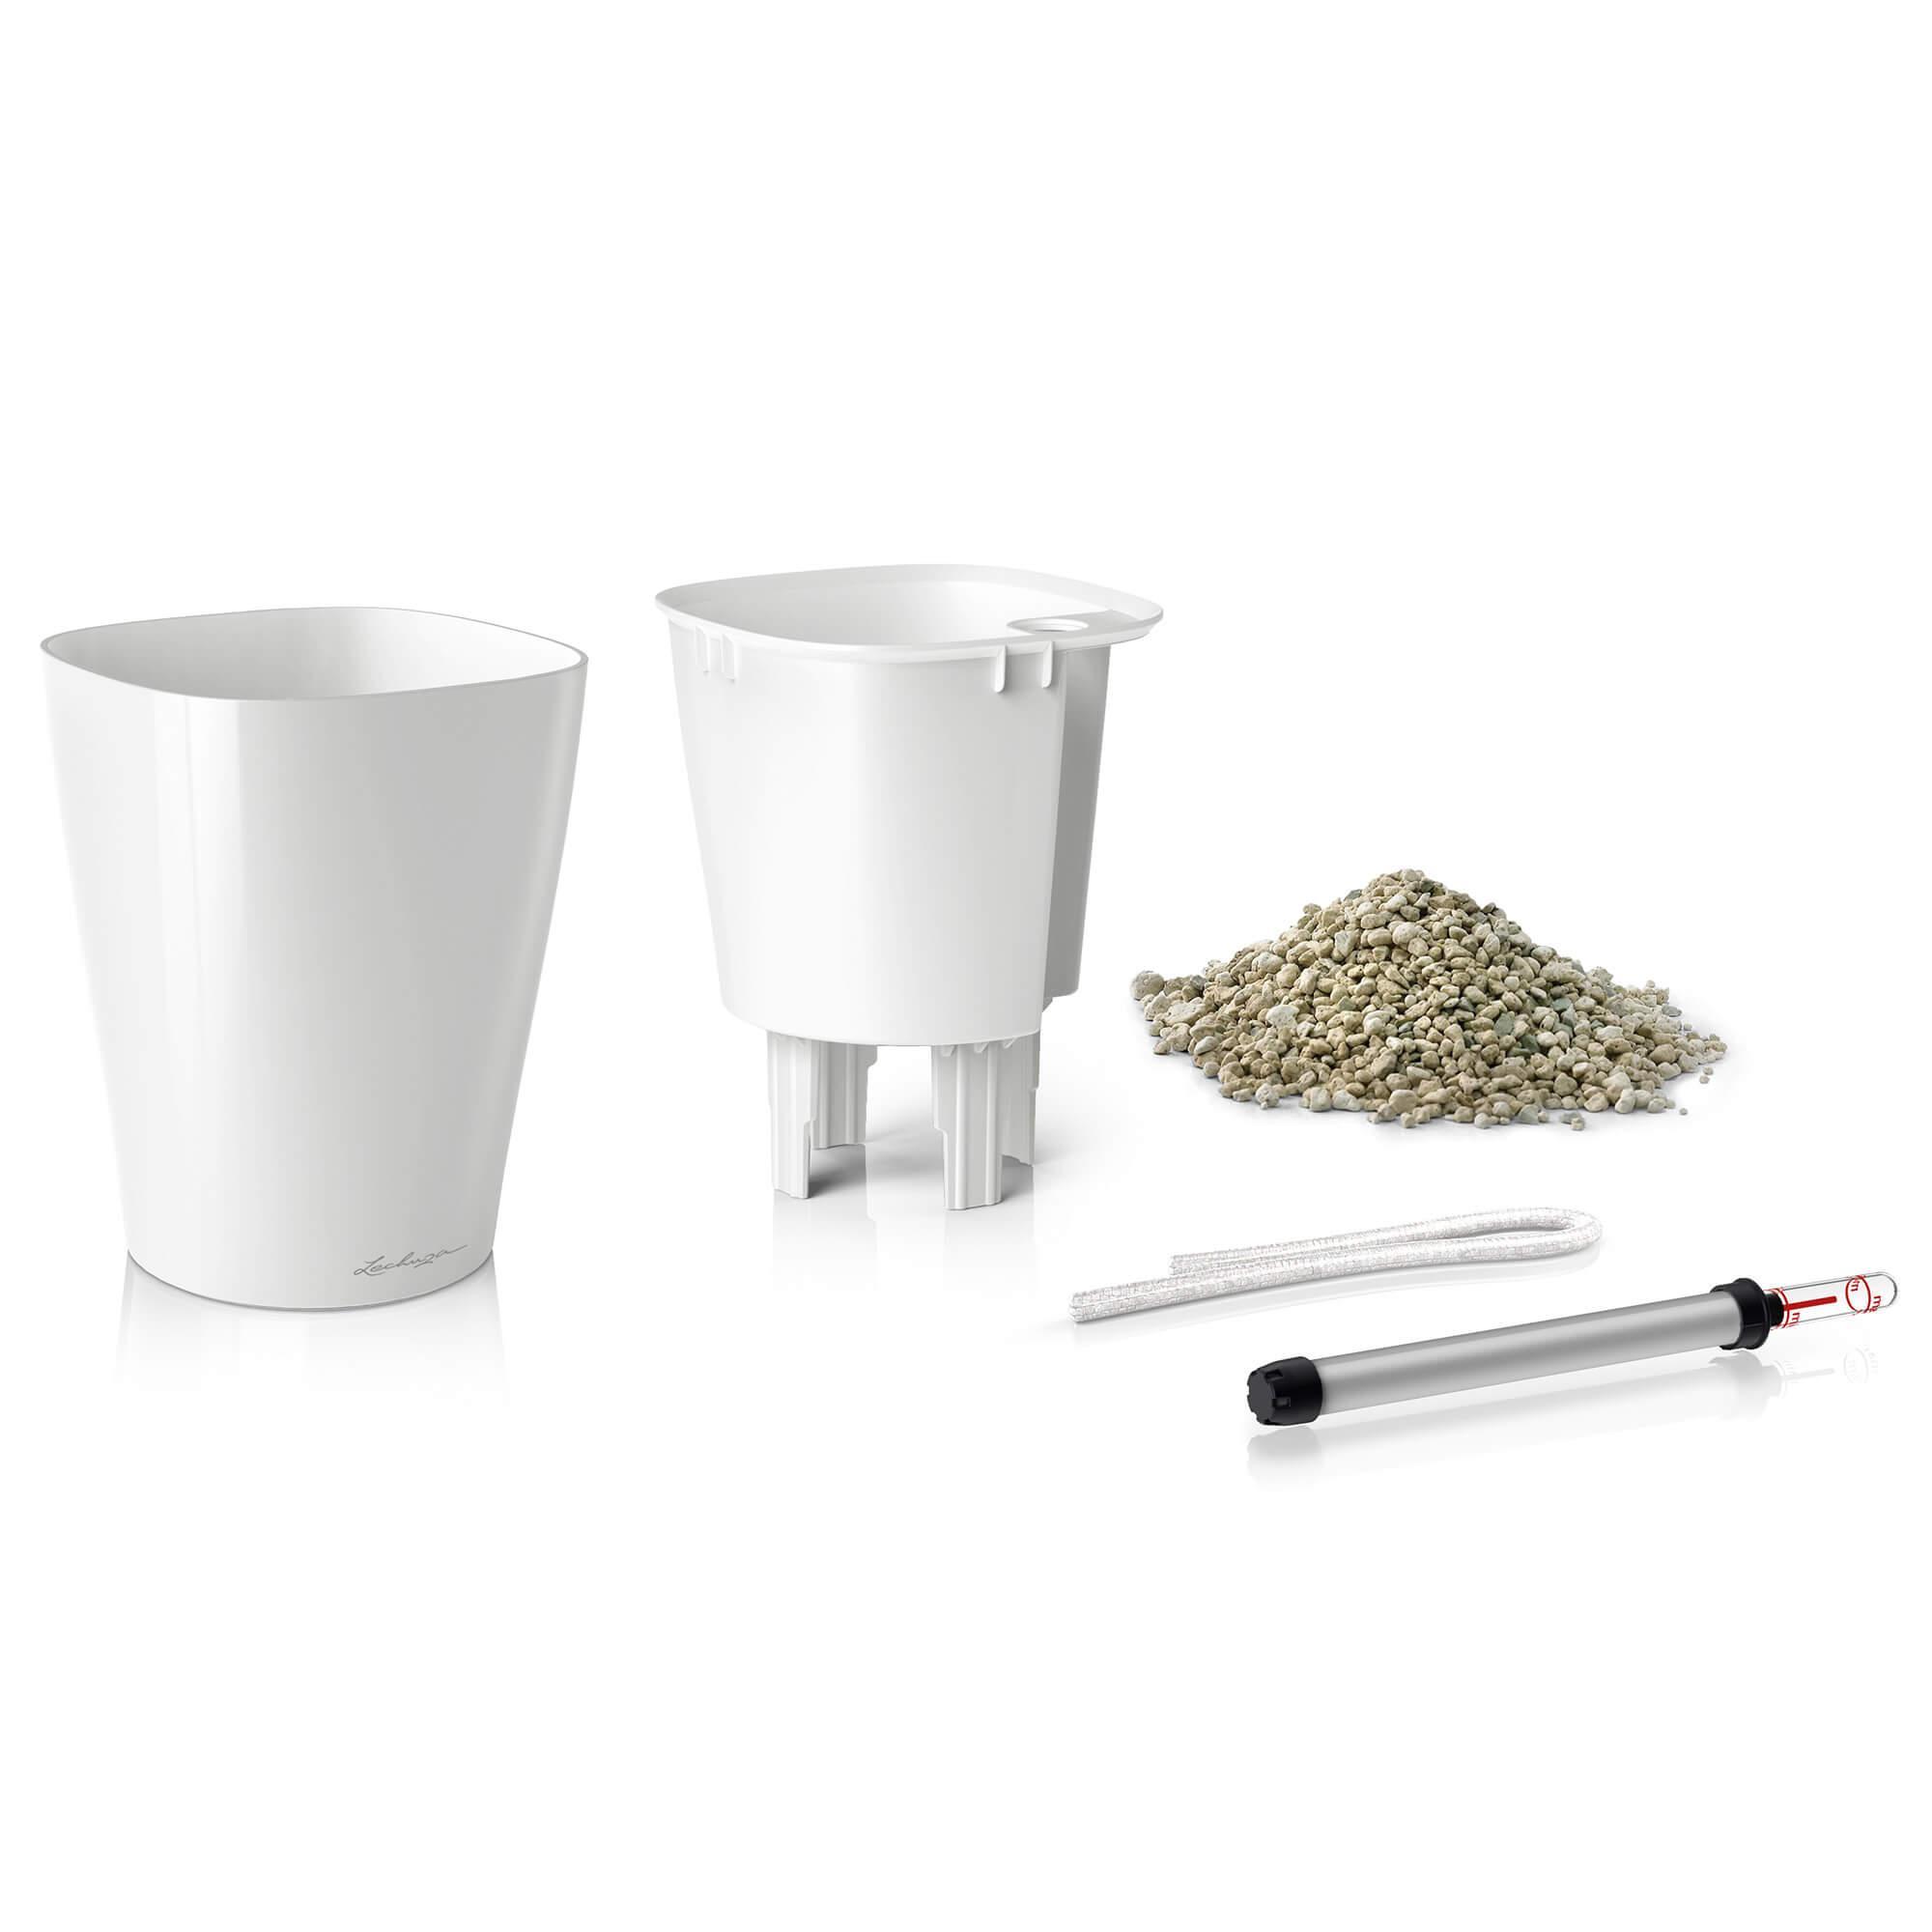 DELTINI espresso metallic - Image 1